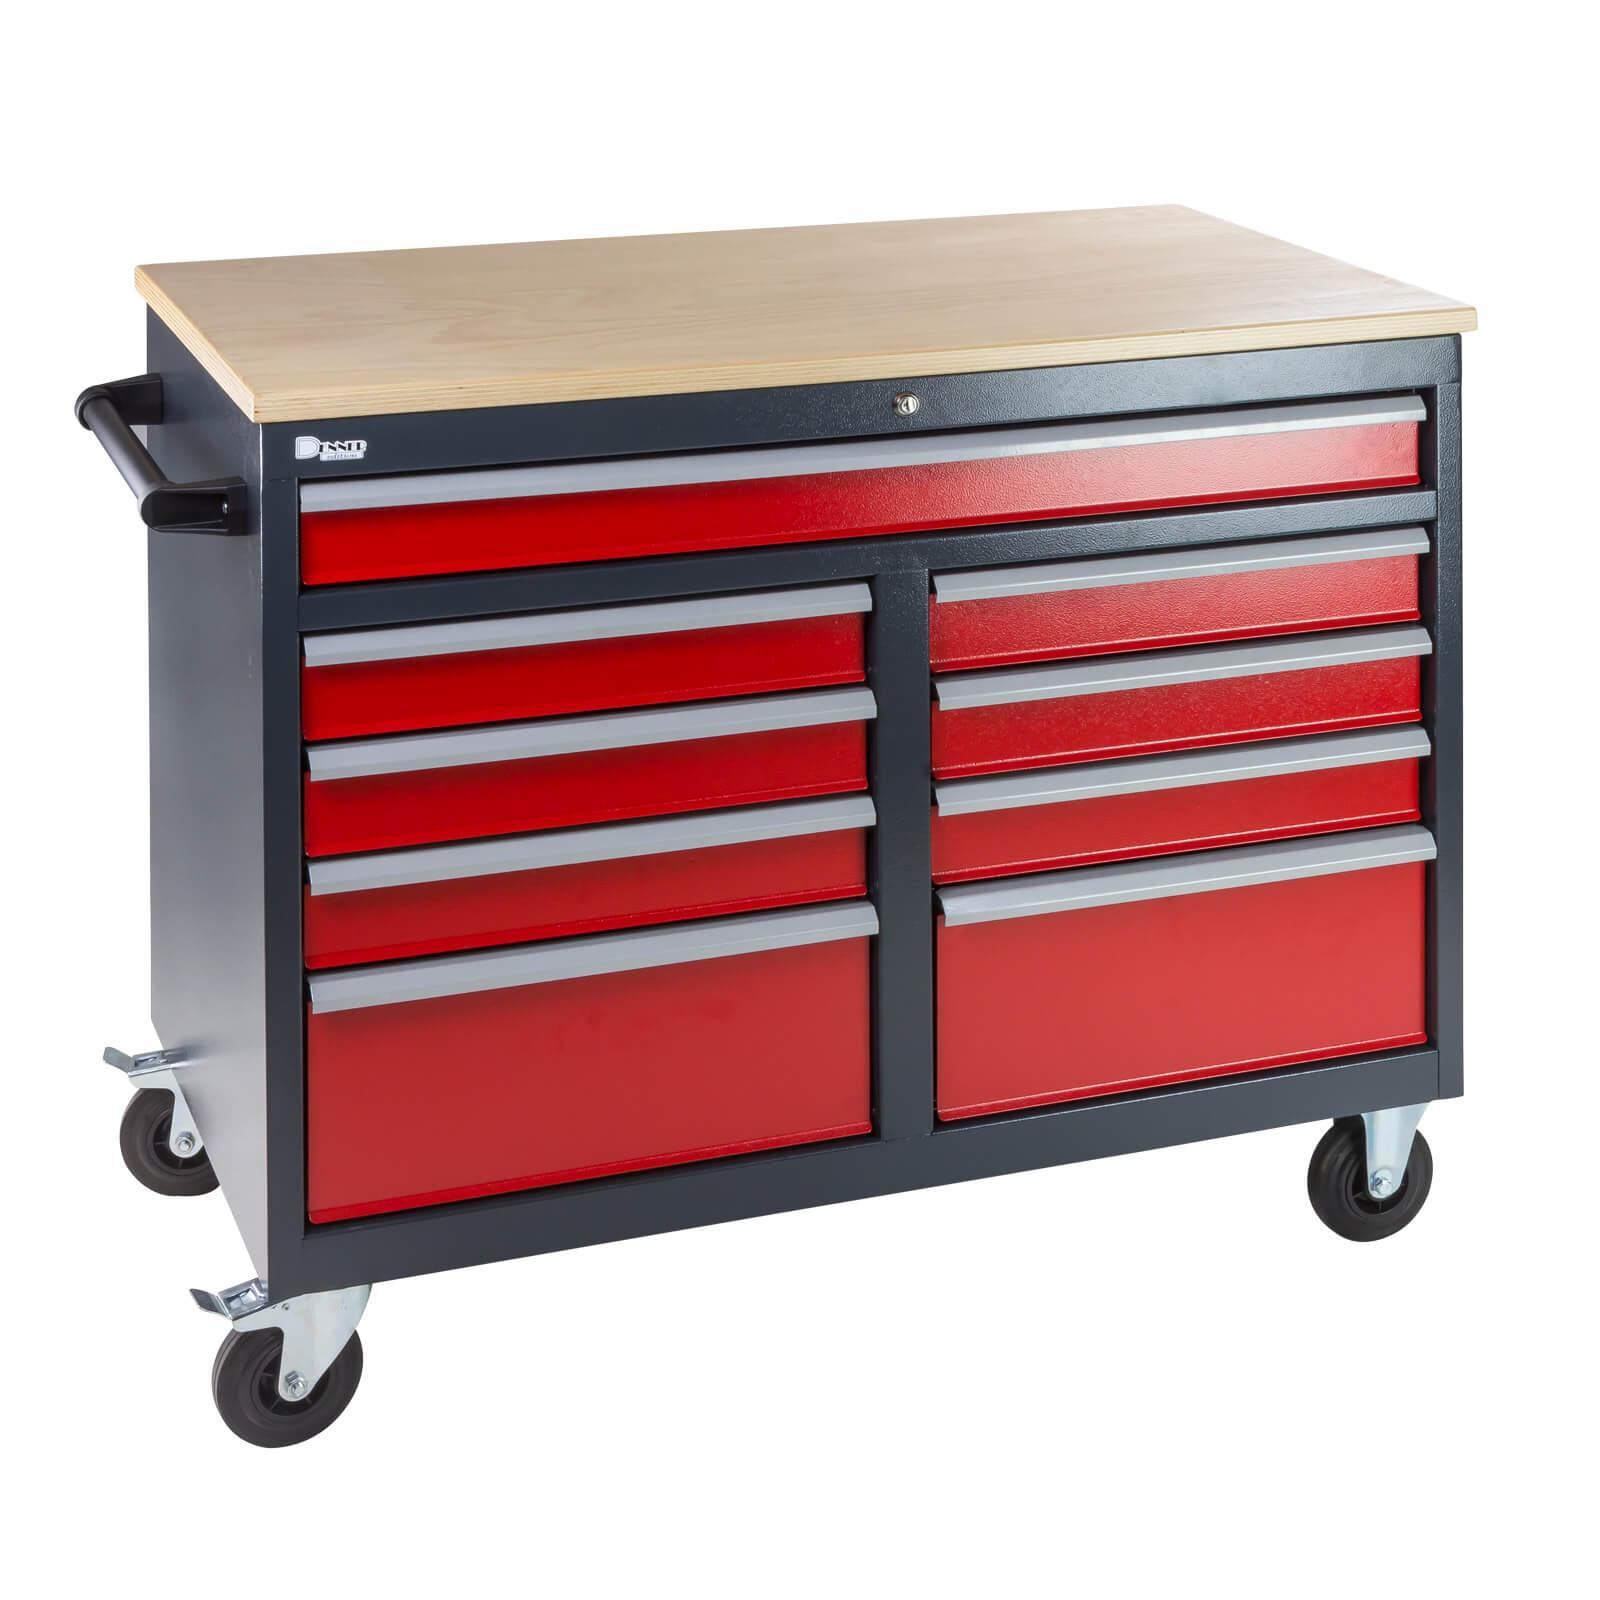 mobile werkbank werktisch werkzeugwagen rollwagen leer. Black Bedroom Furniture Sets. Home Design Ideas